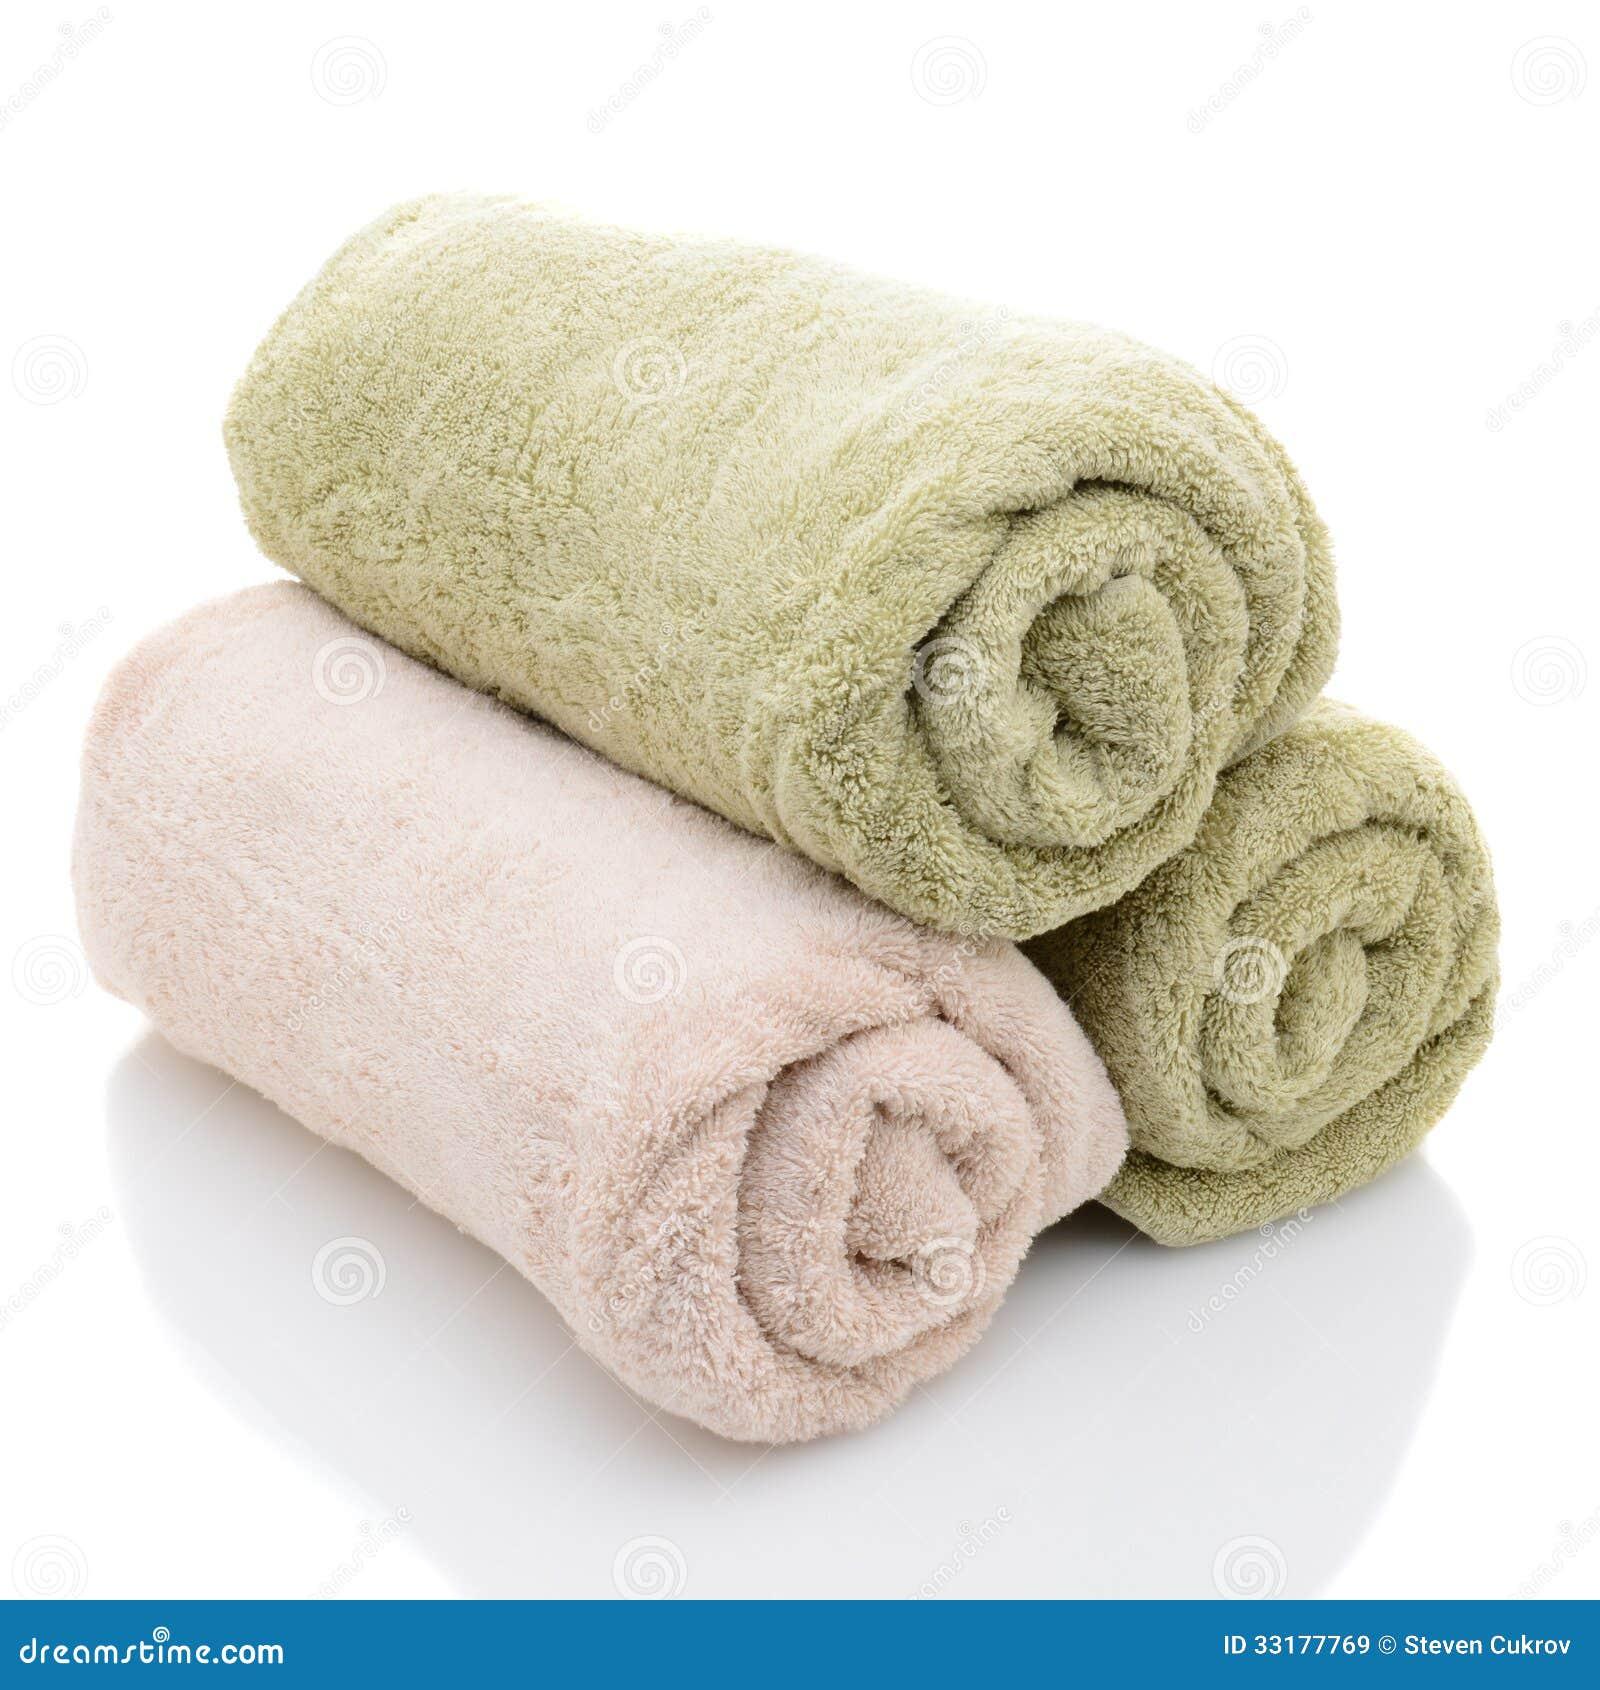 Rolled Towels In Bathroom